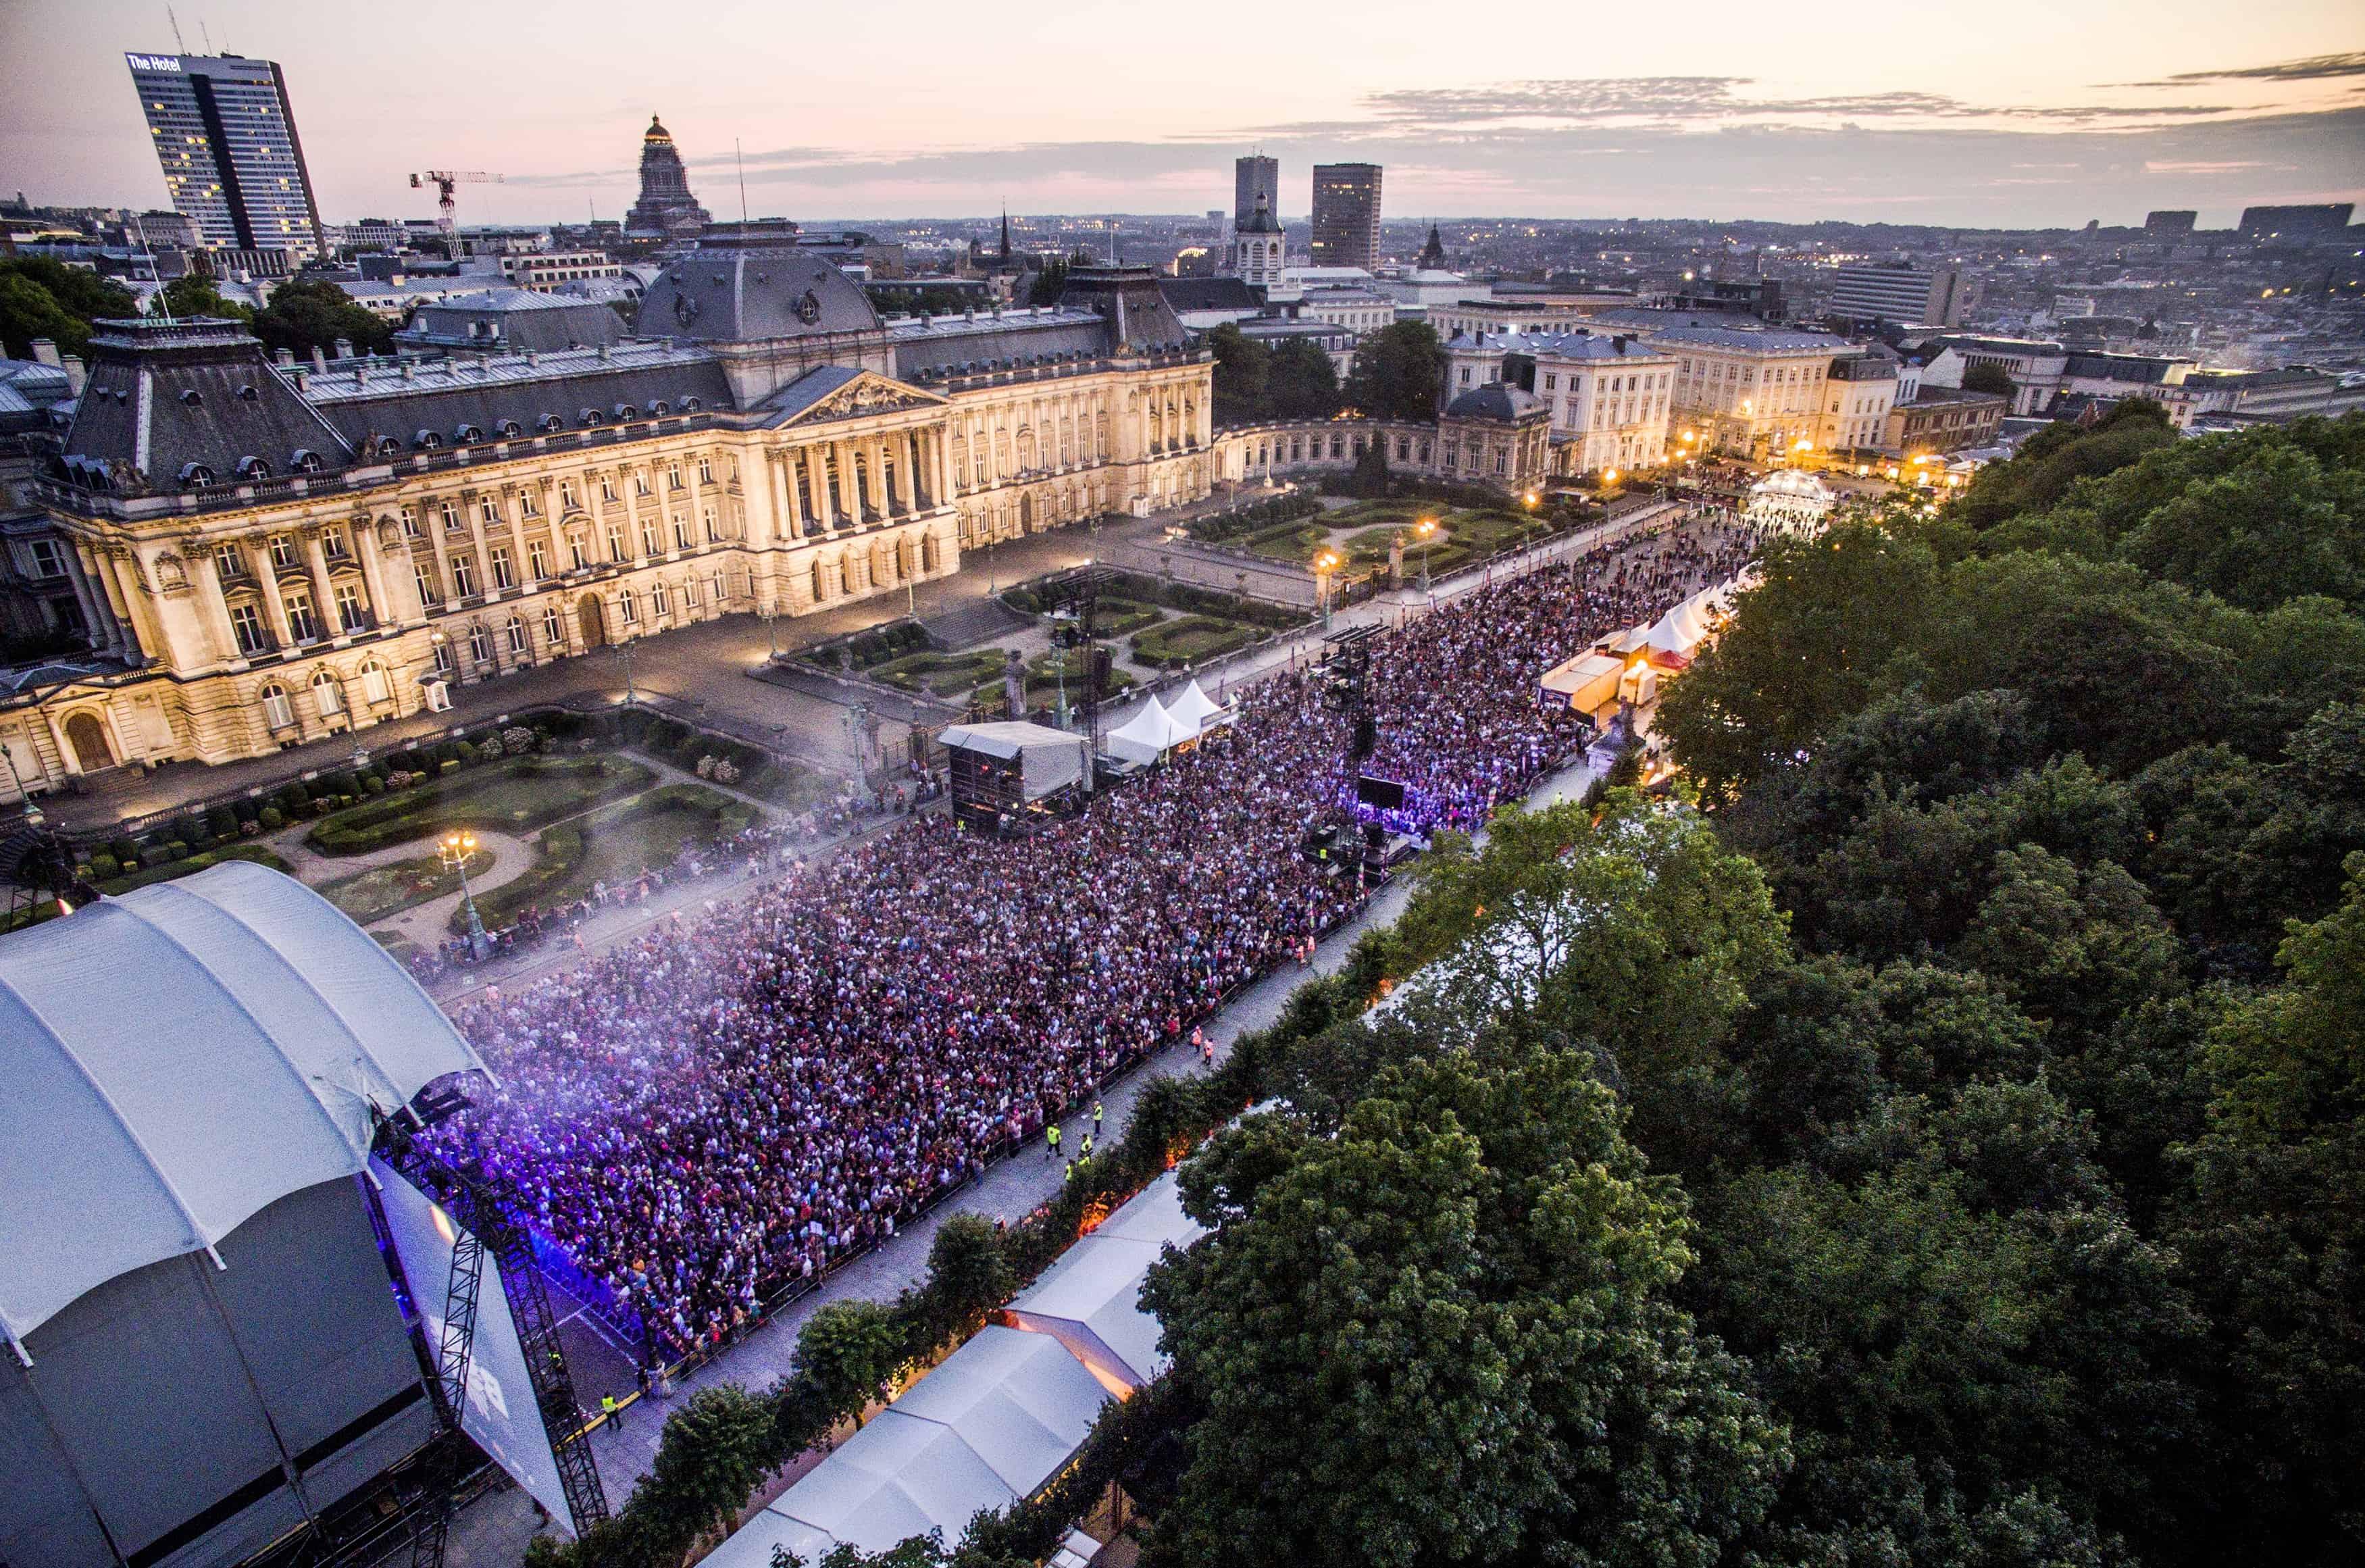 Brussel Summer Festival 2015